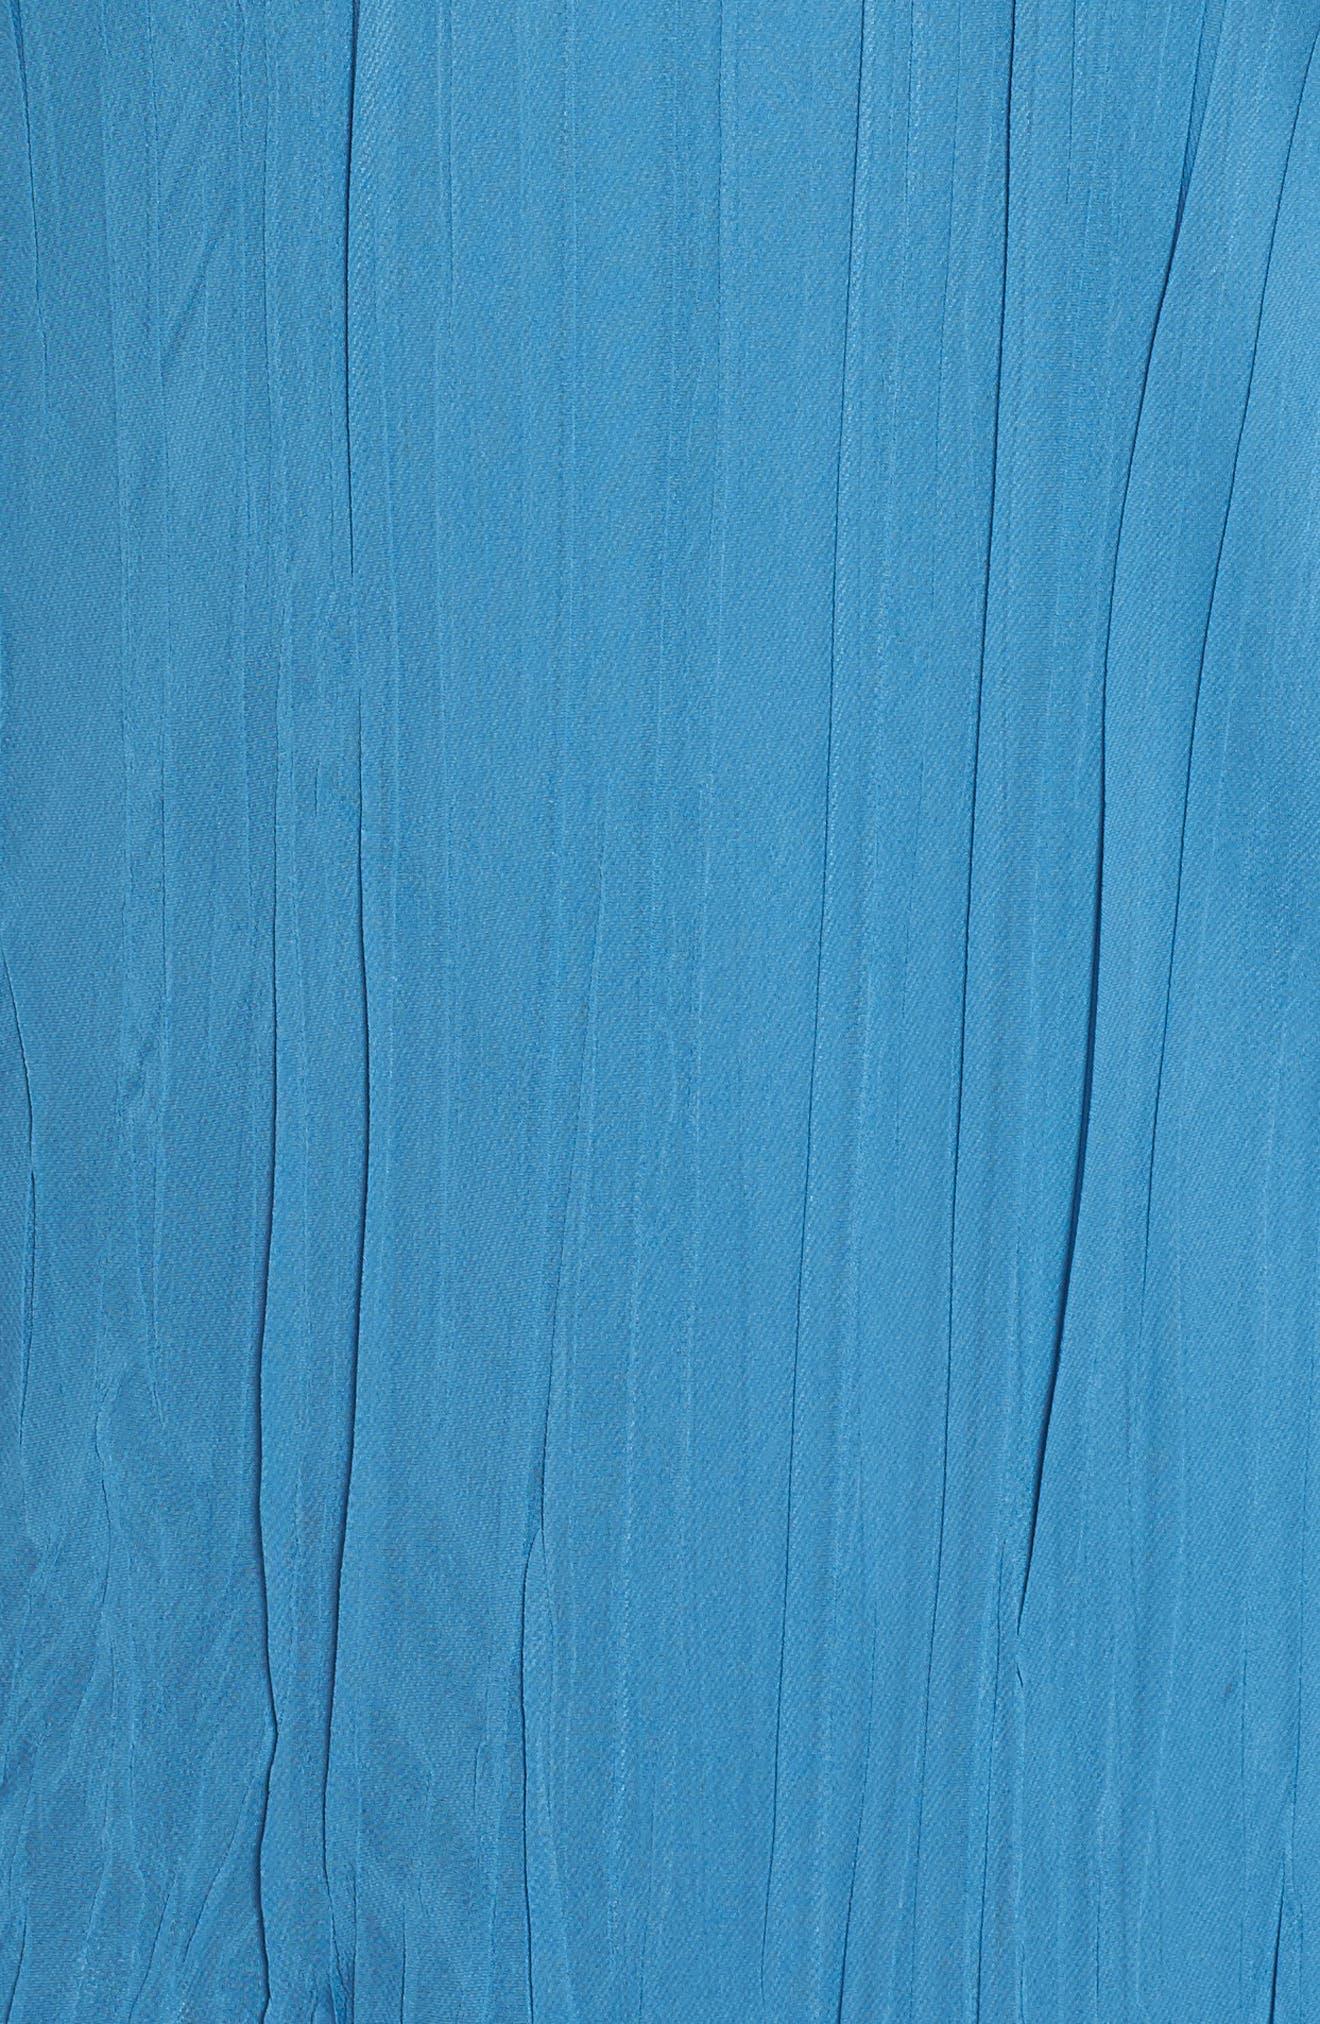 Dress Tiered Chiffon & Charmeuse Dress,                             Alternate thumbnail 5, color,                             400